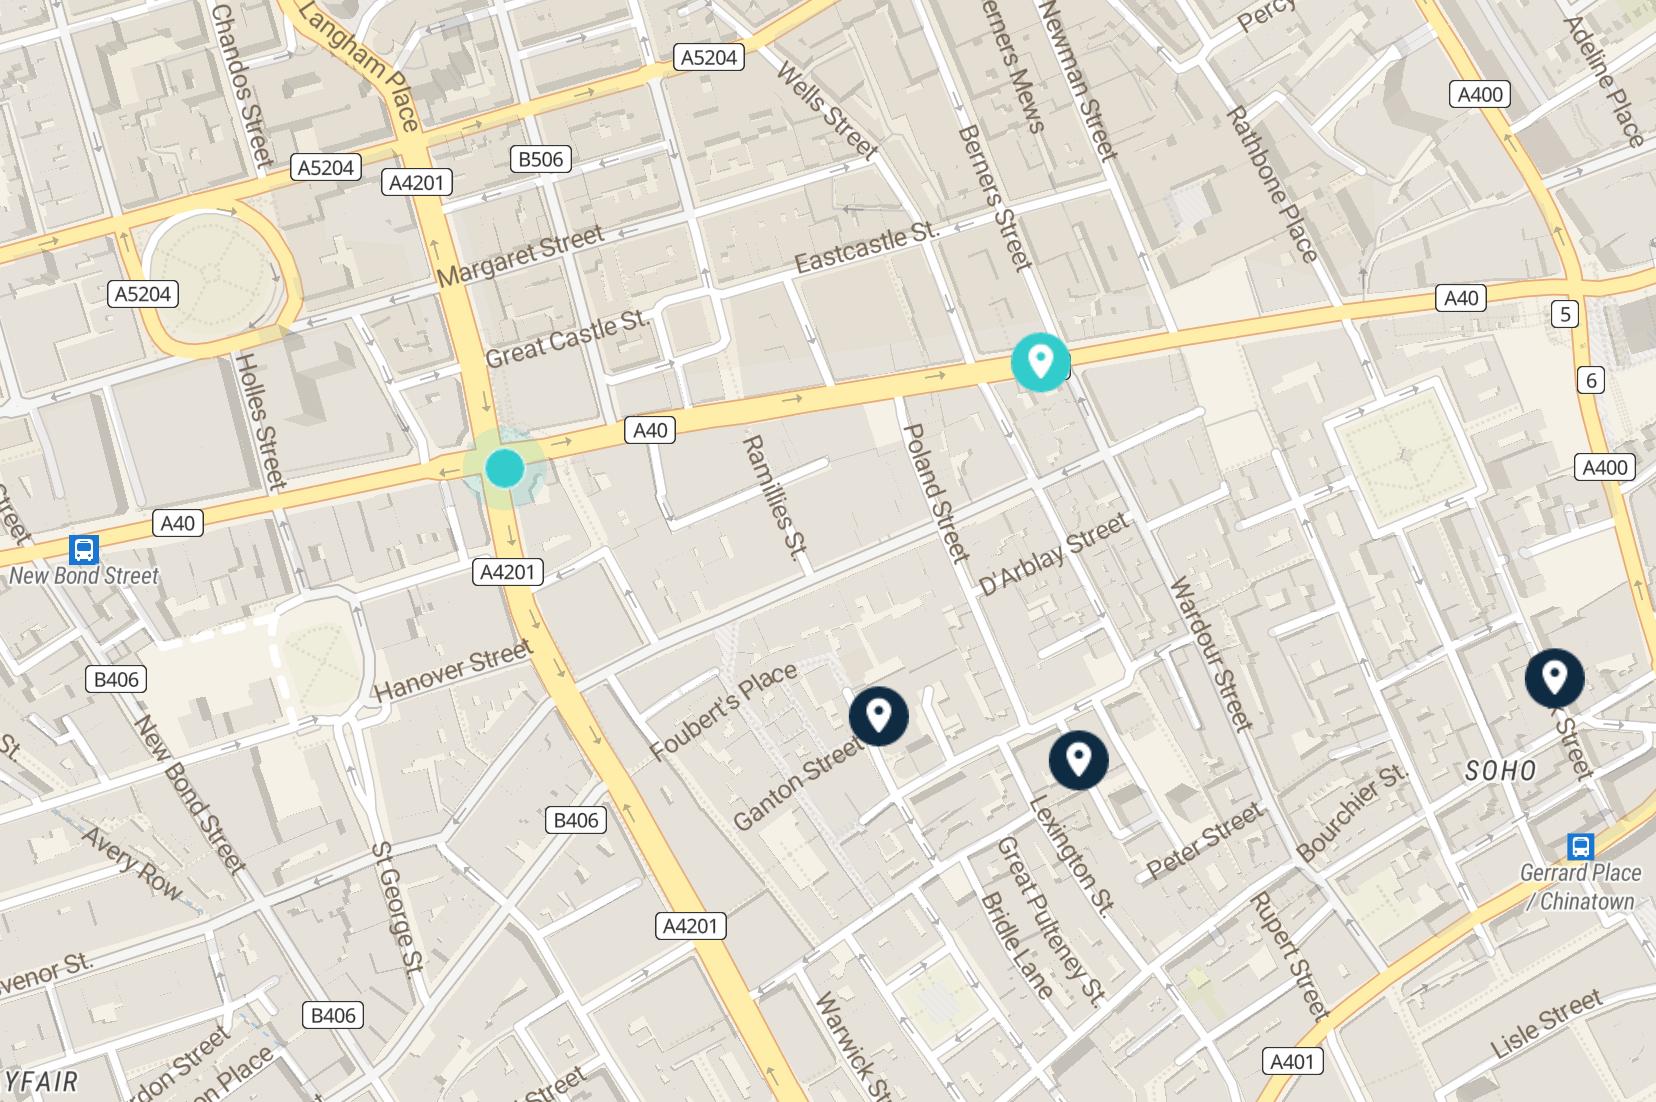 oxford street map: luggage storage